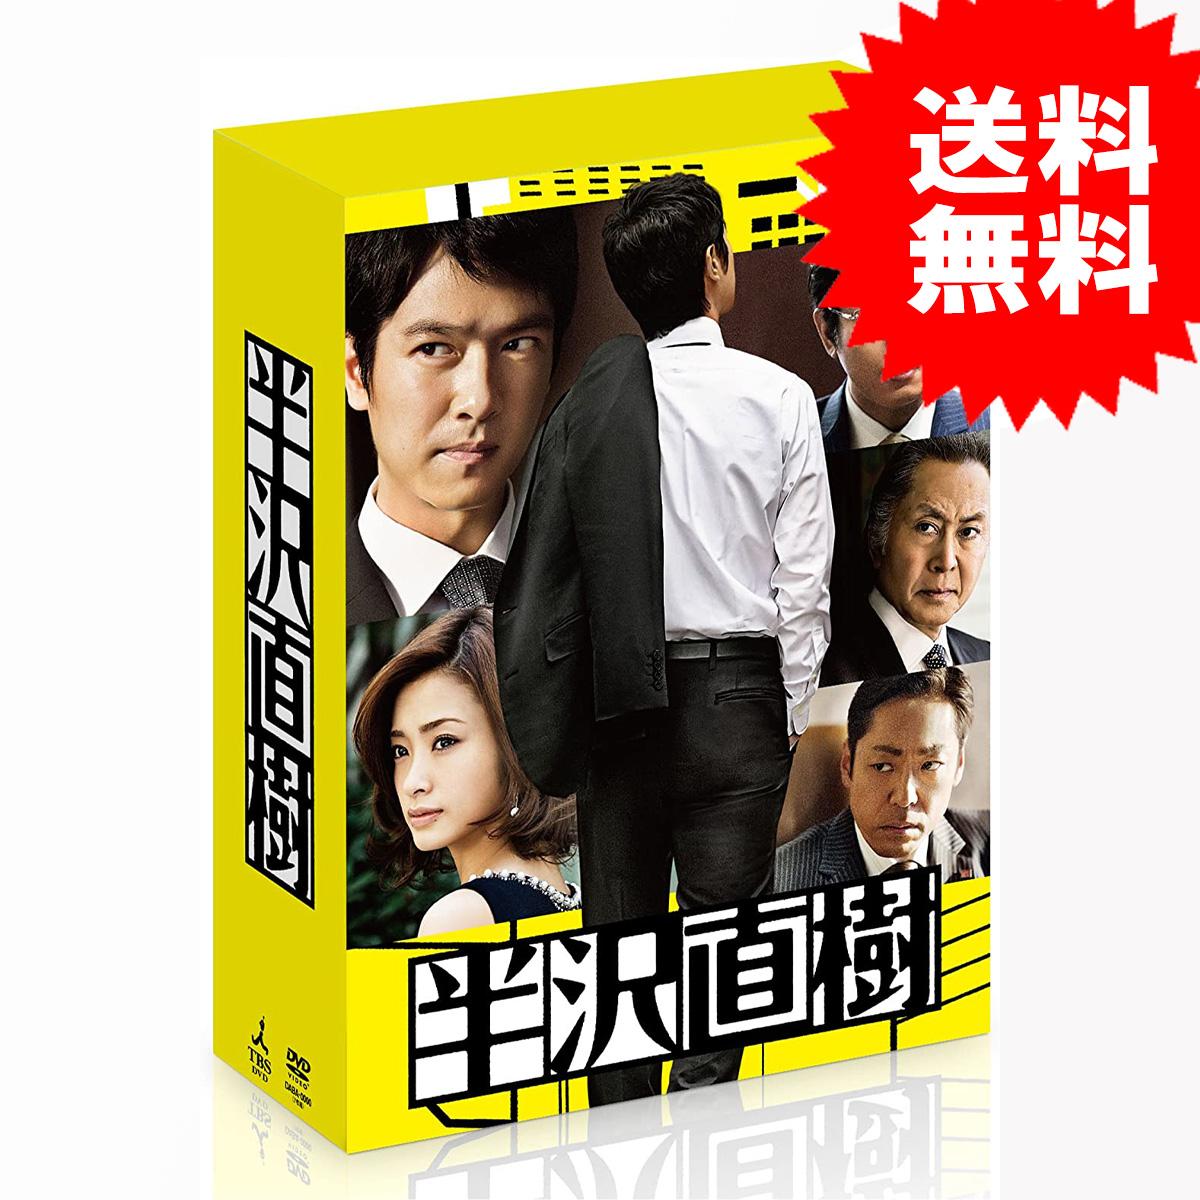 <title>送料無料 半沢直樹 -ディレクターズカット版- DVD-BOX トラスト</title>